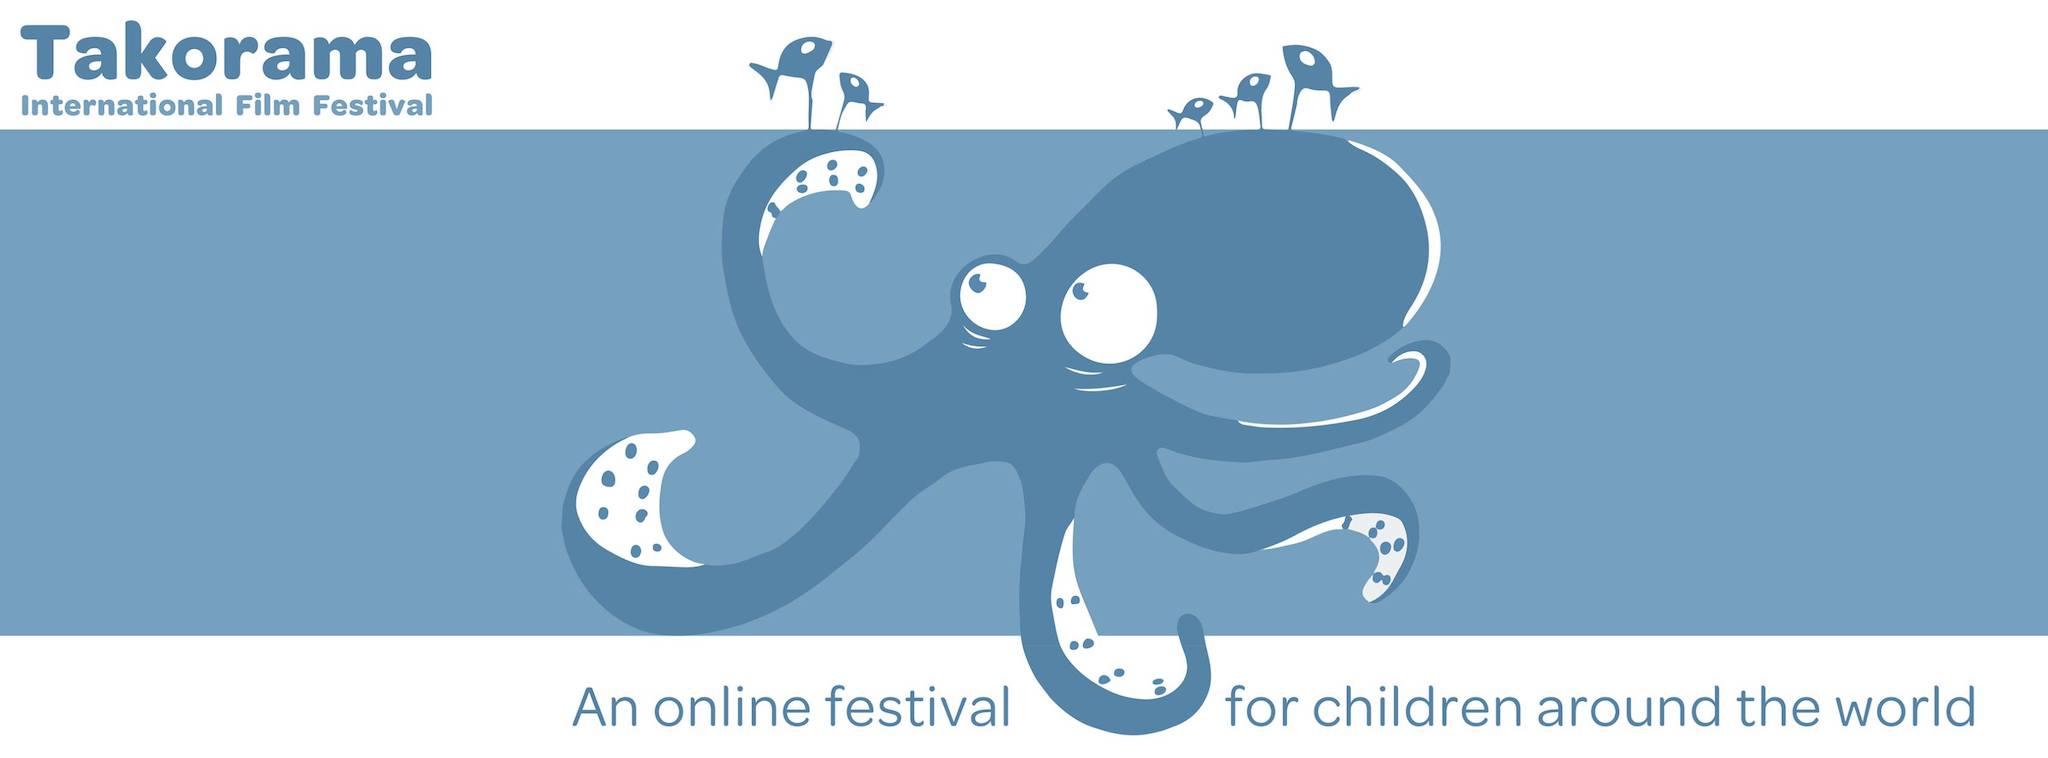 Takorama International Film Festival affiche cinéma court-métrages animation